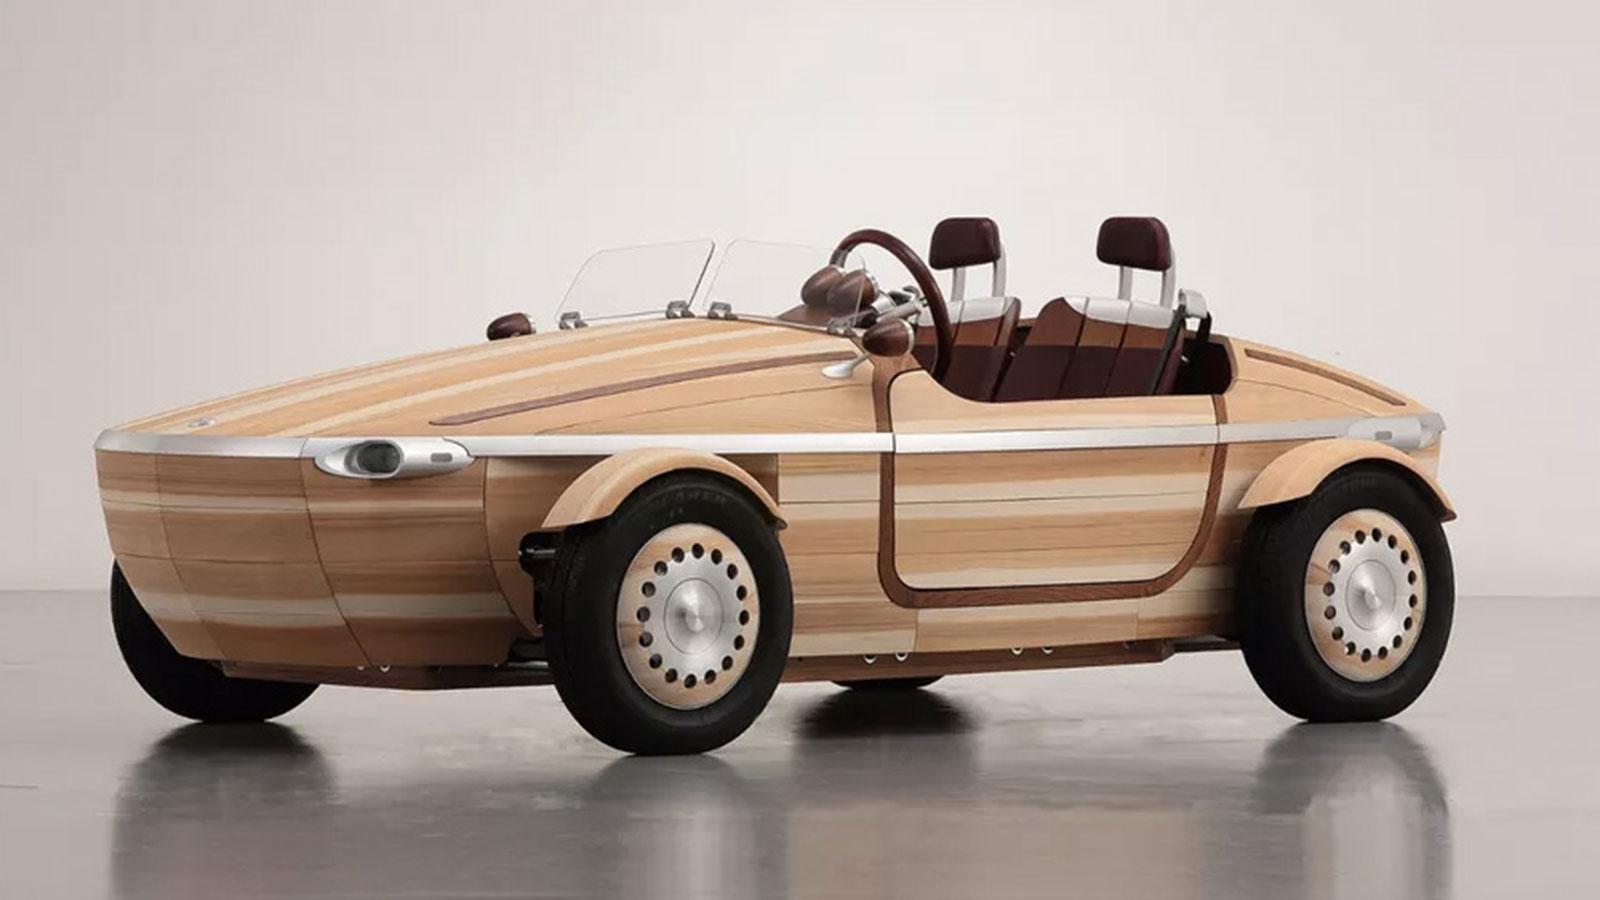 toyota-setsuna-wooden-car-02